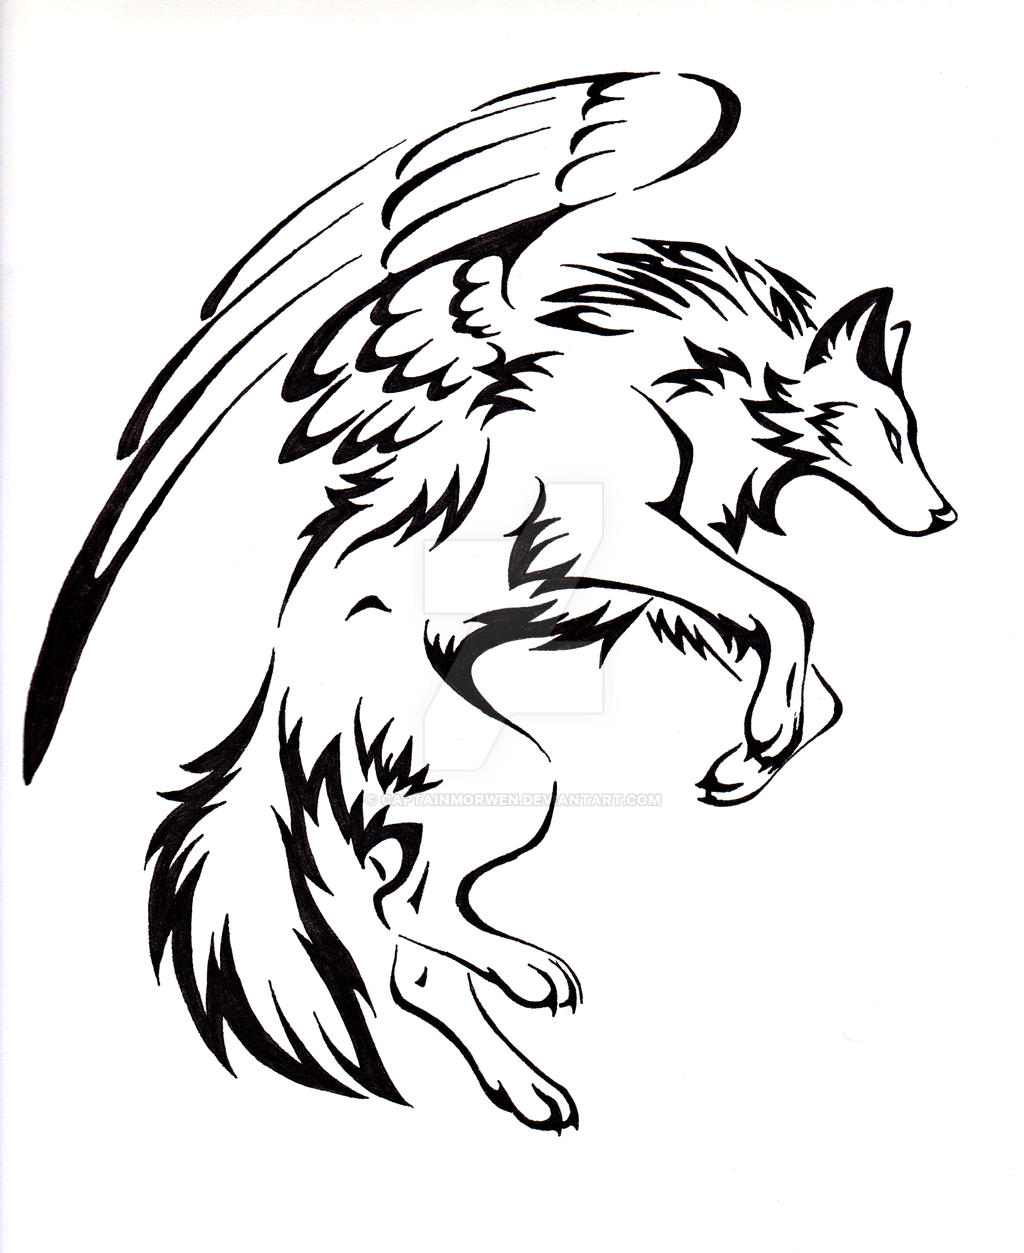 Courage Winged Wolf Tattoo by CaptainMorwen on DeviantArt